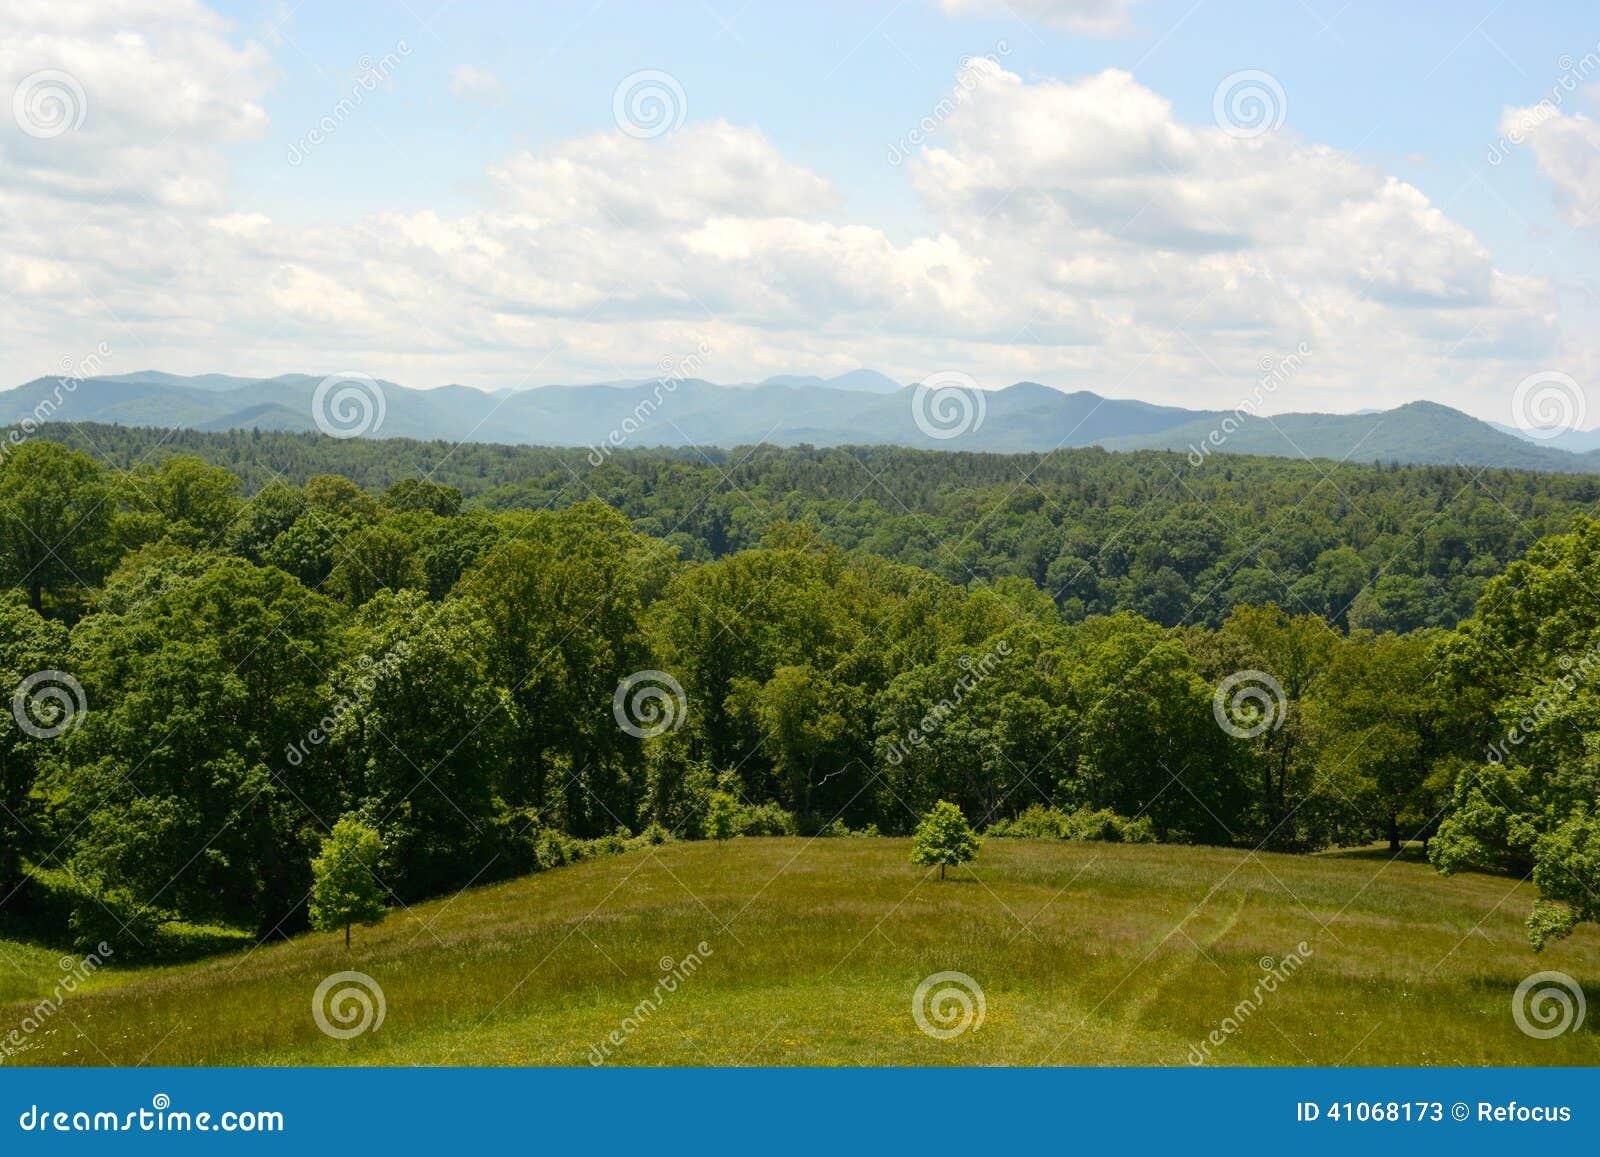 Asheville North Carolina - 04